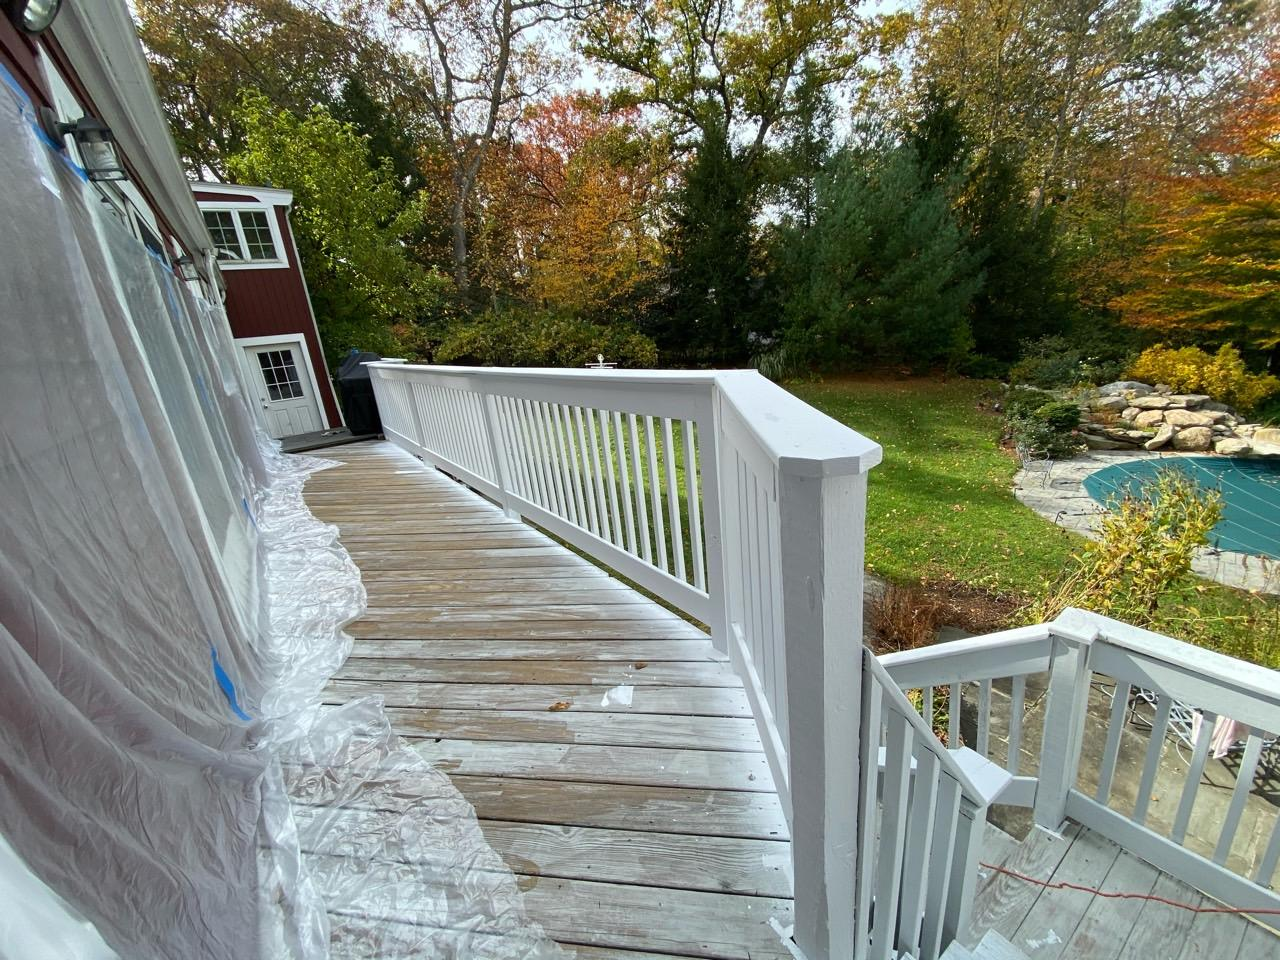 Deck Staining - Stamford Deck Staining - Railing Pimer ...